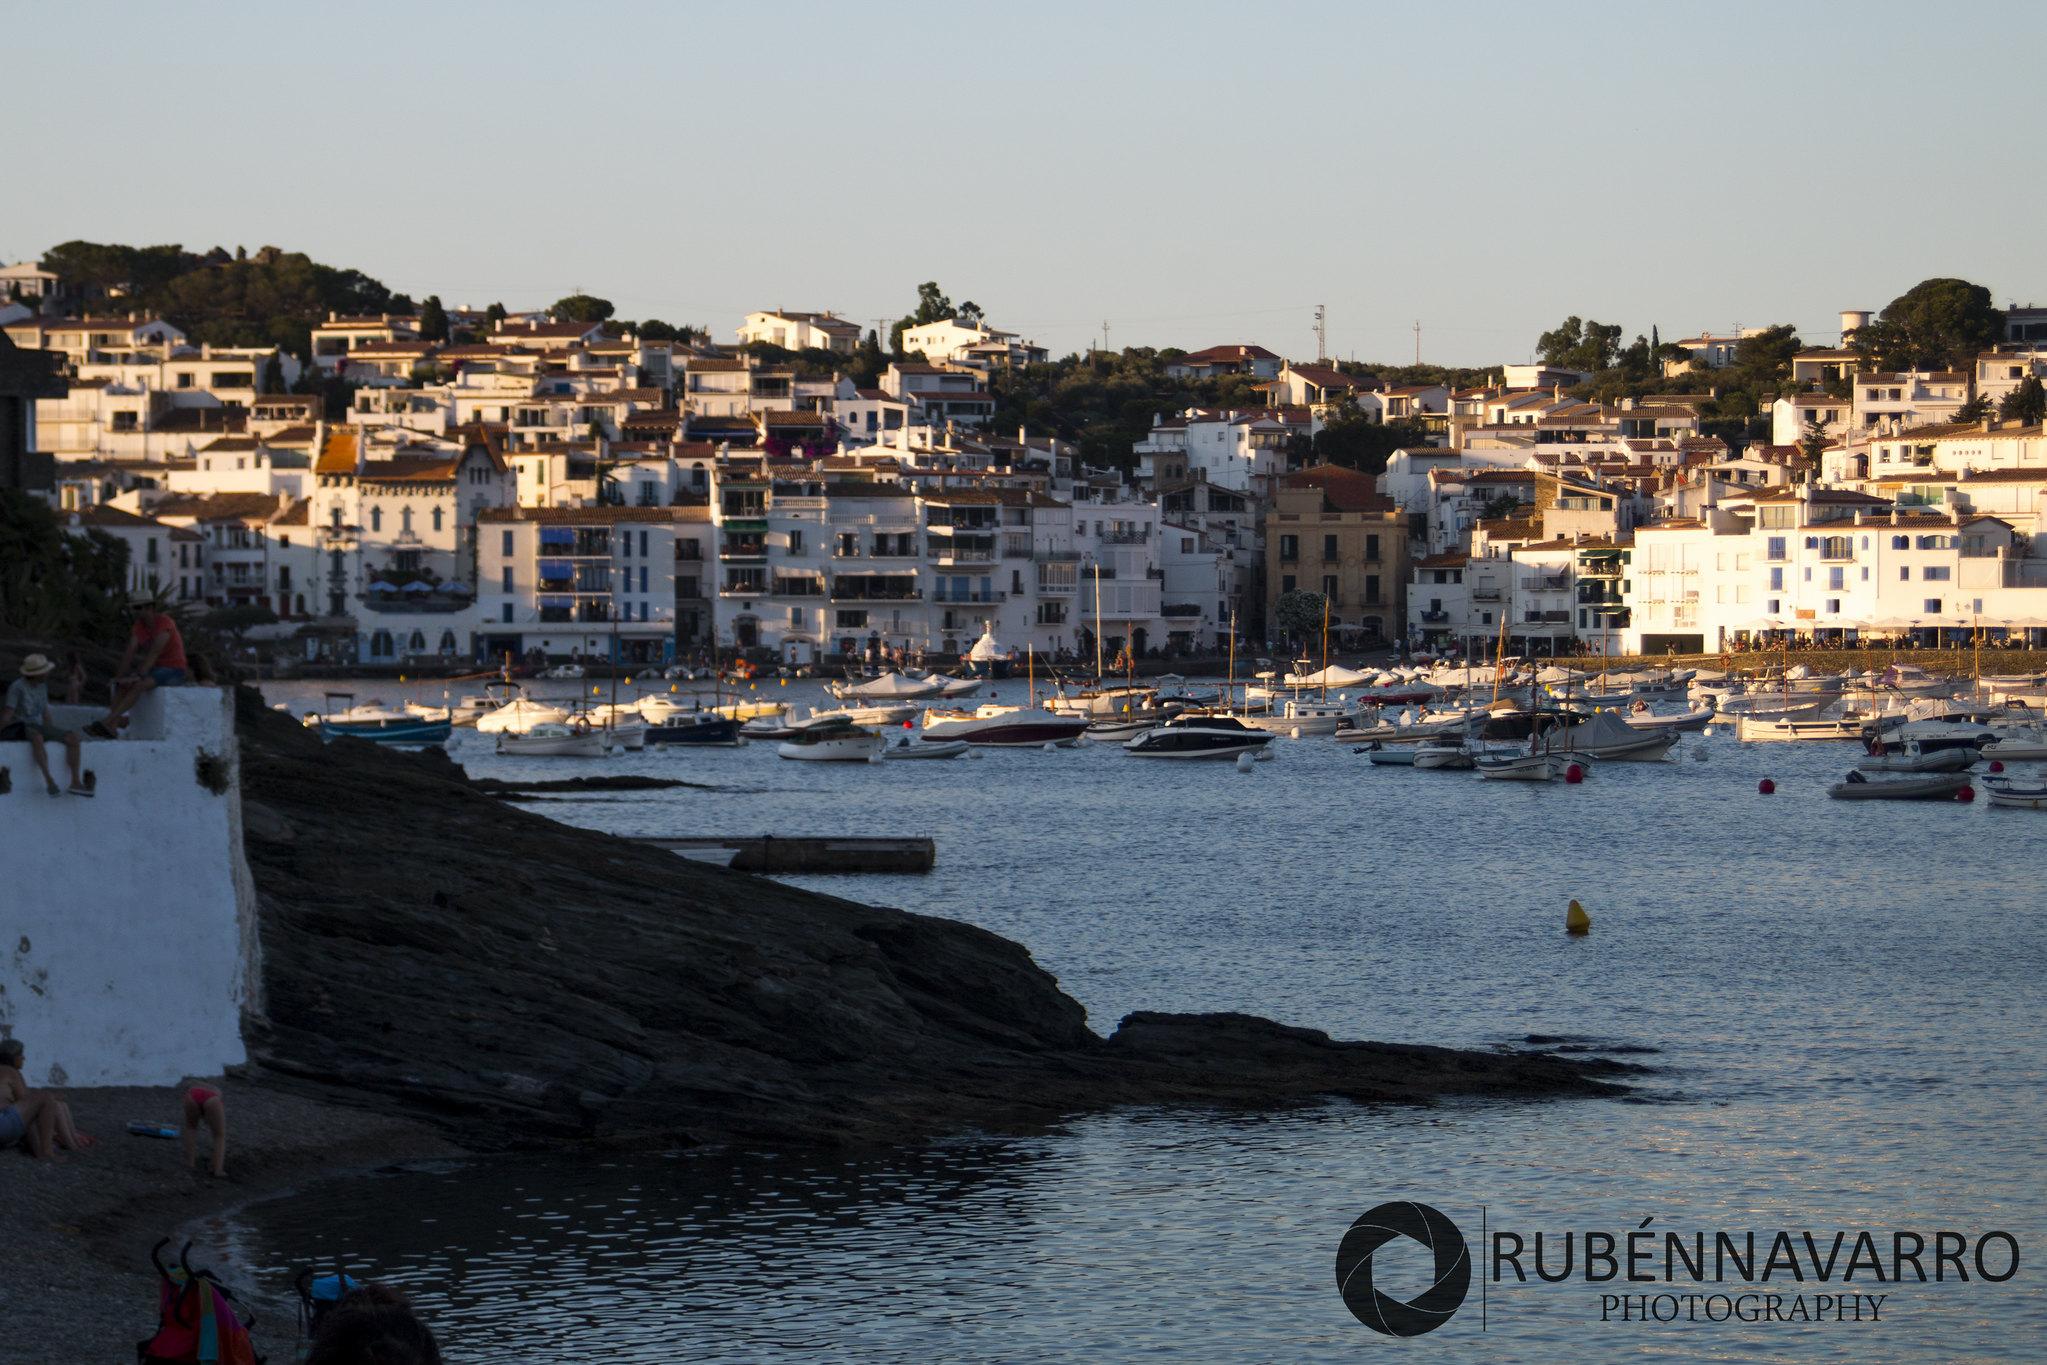 Viaje romántico a Cadaqués, Costa Brava